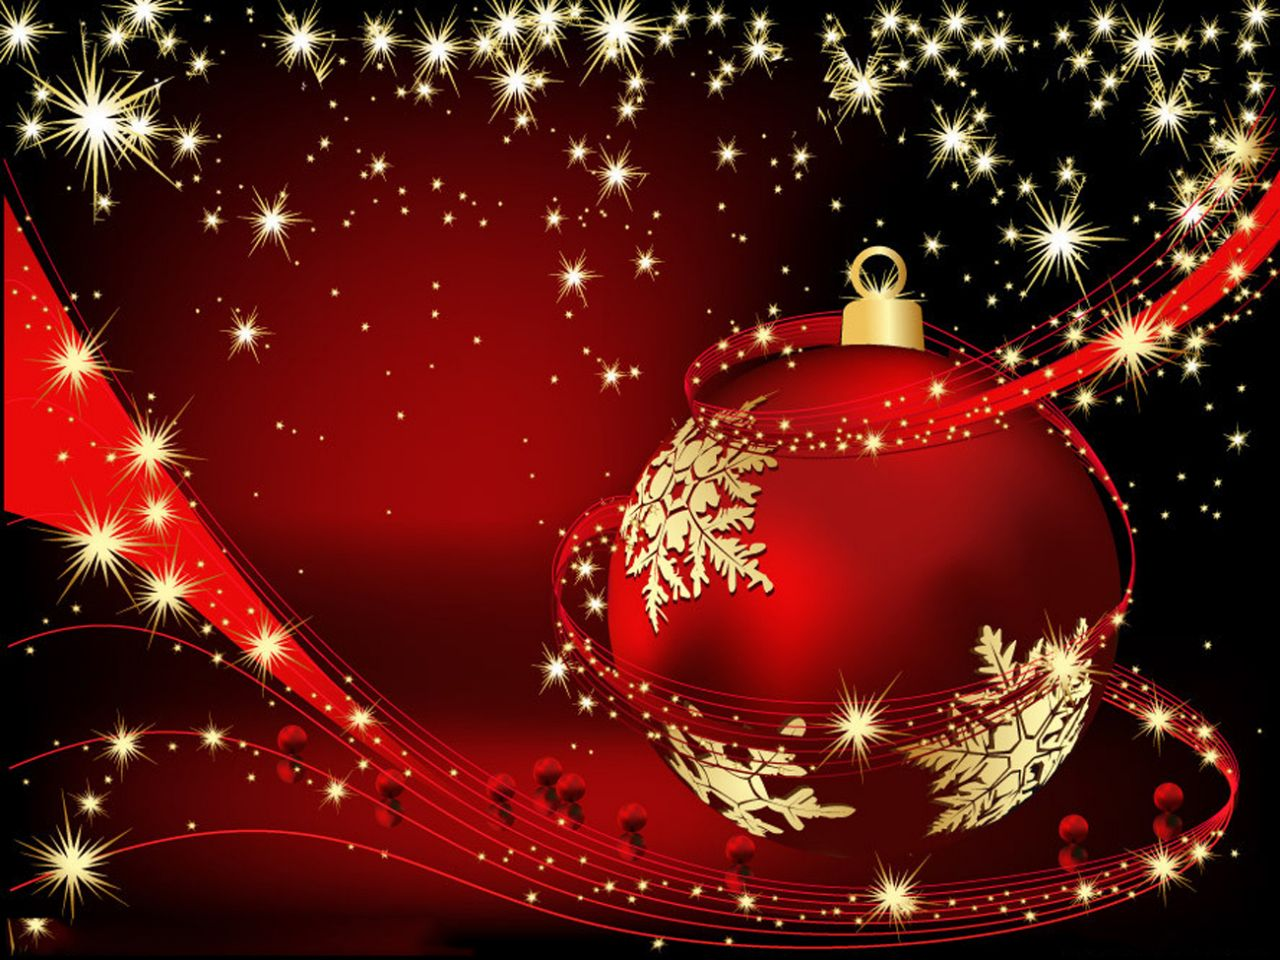 Happy Holidays Wallpapers Full HD 43X5GFR WallpapersExpertcom 1280x960